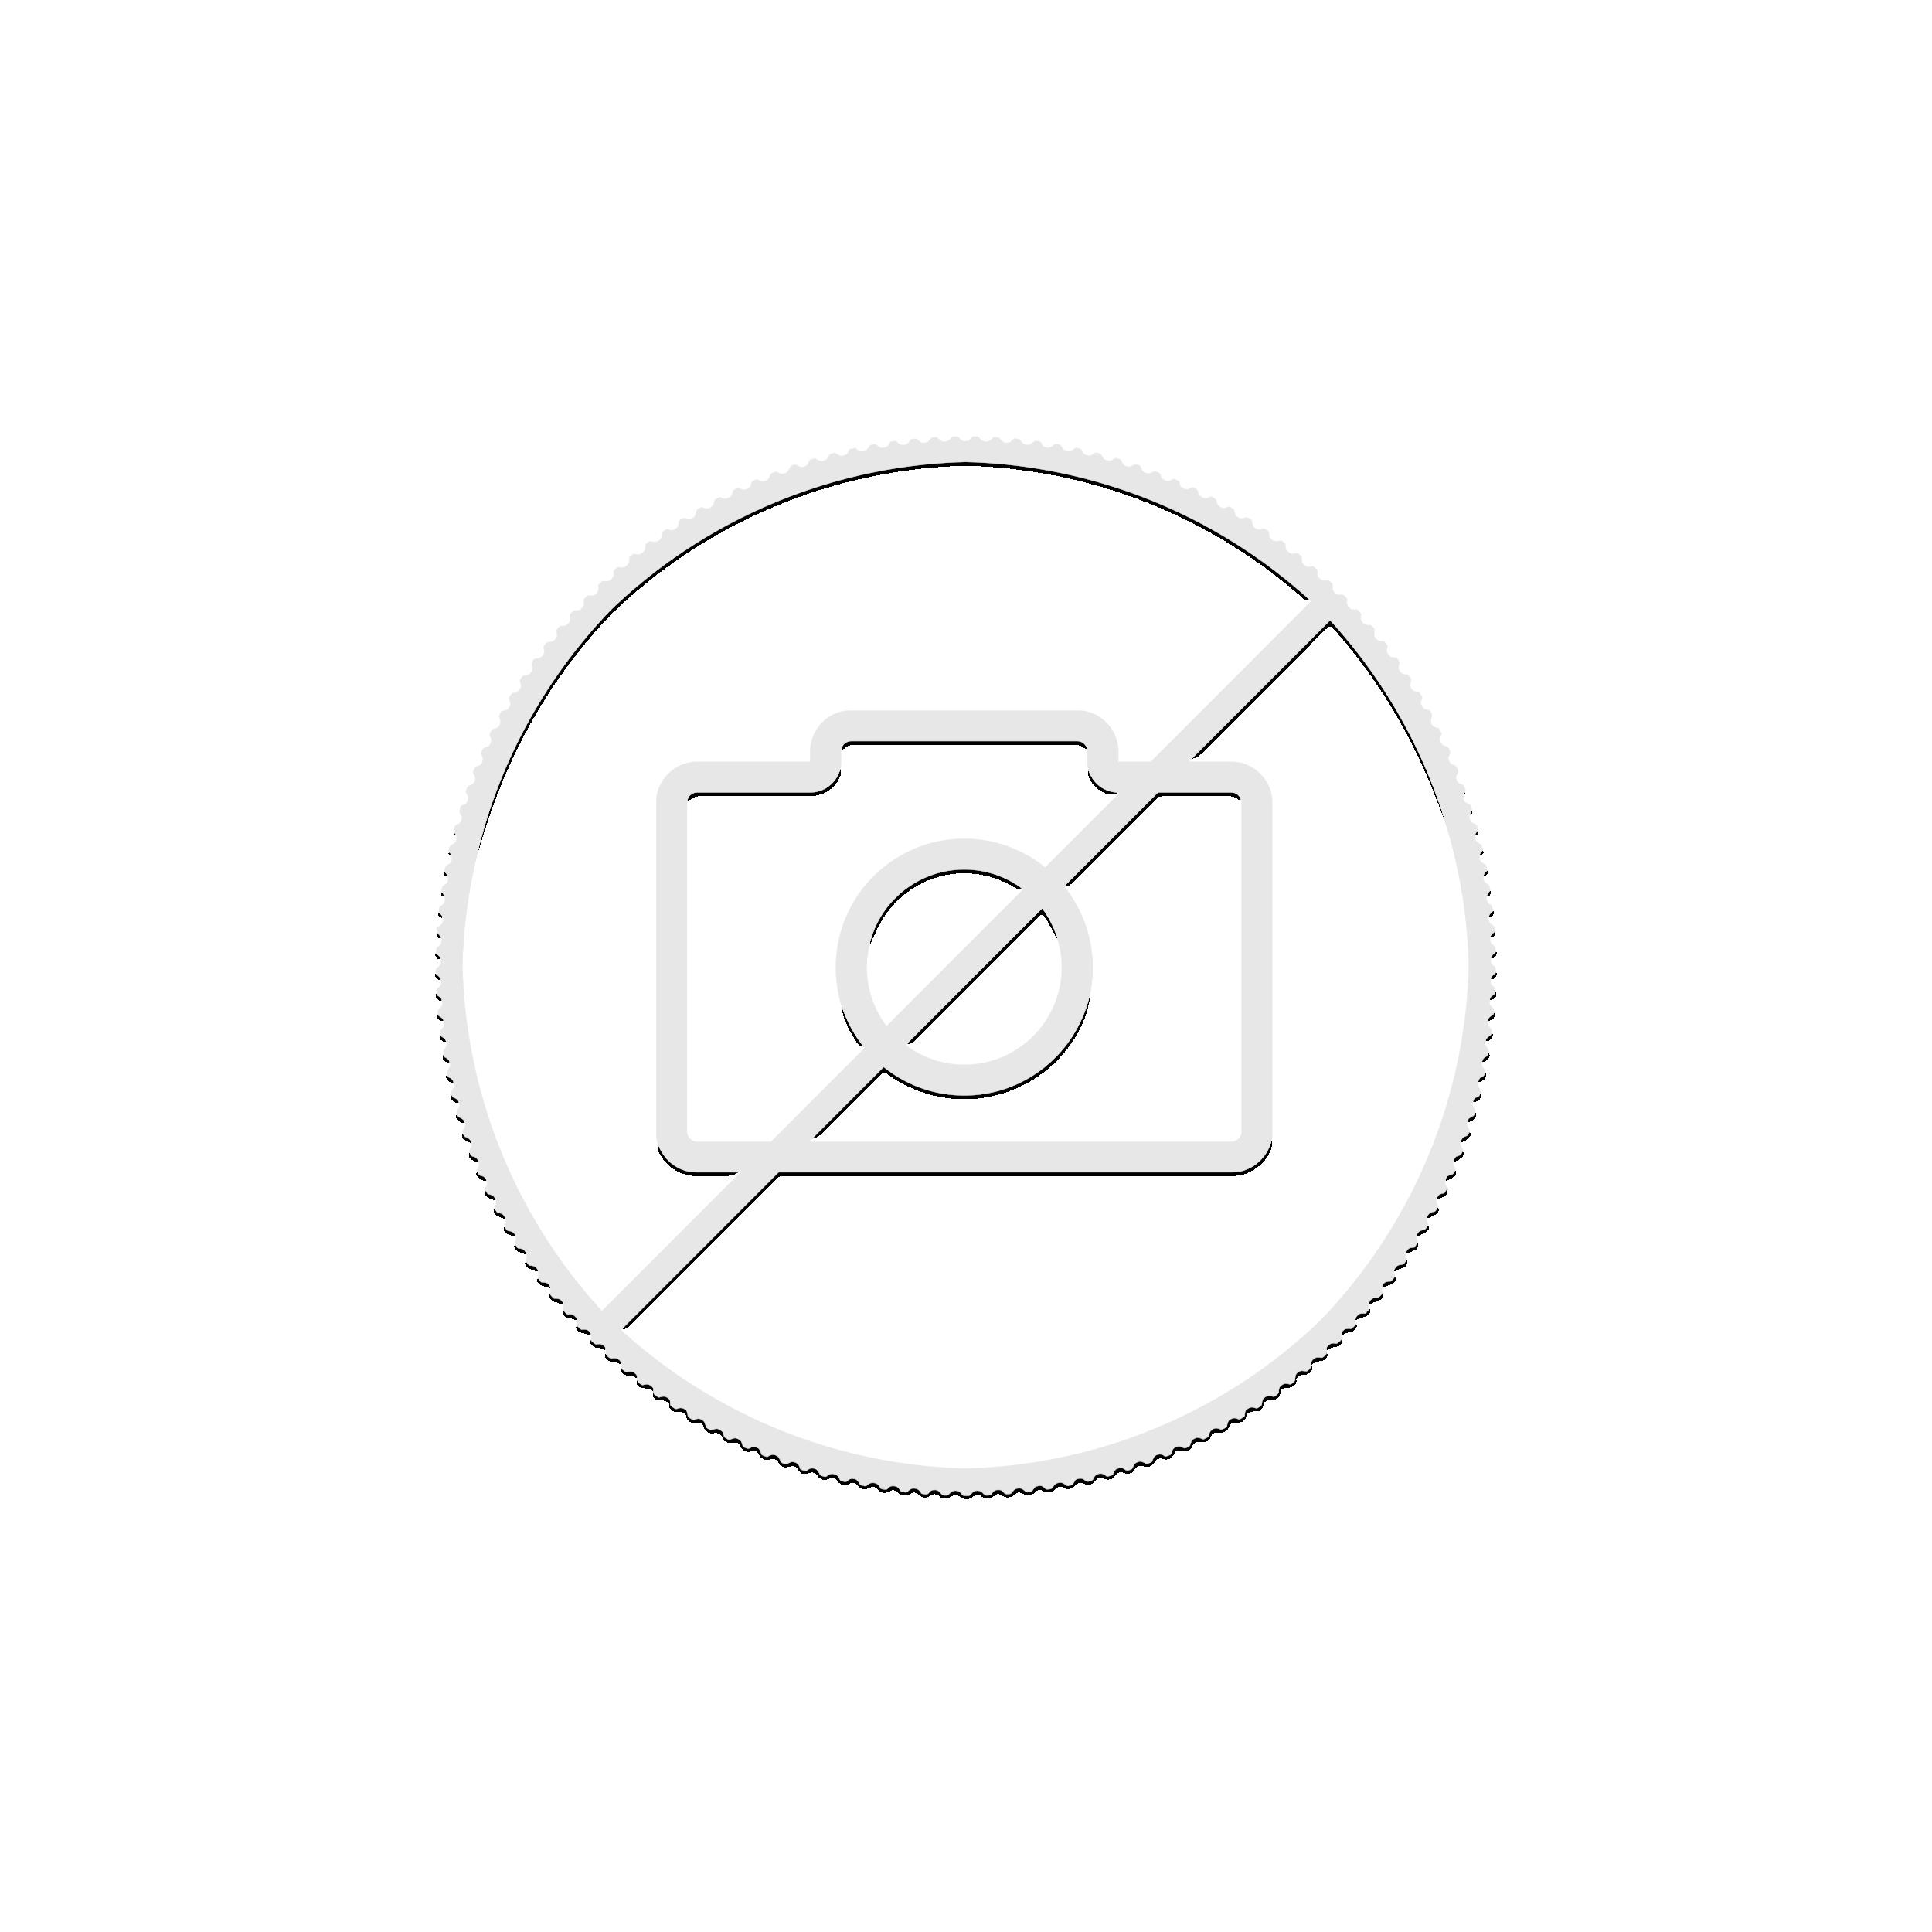 1/4 Troy ounce gold Krugerrand coin 2019